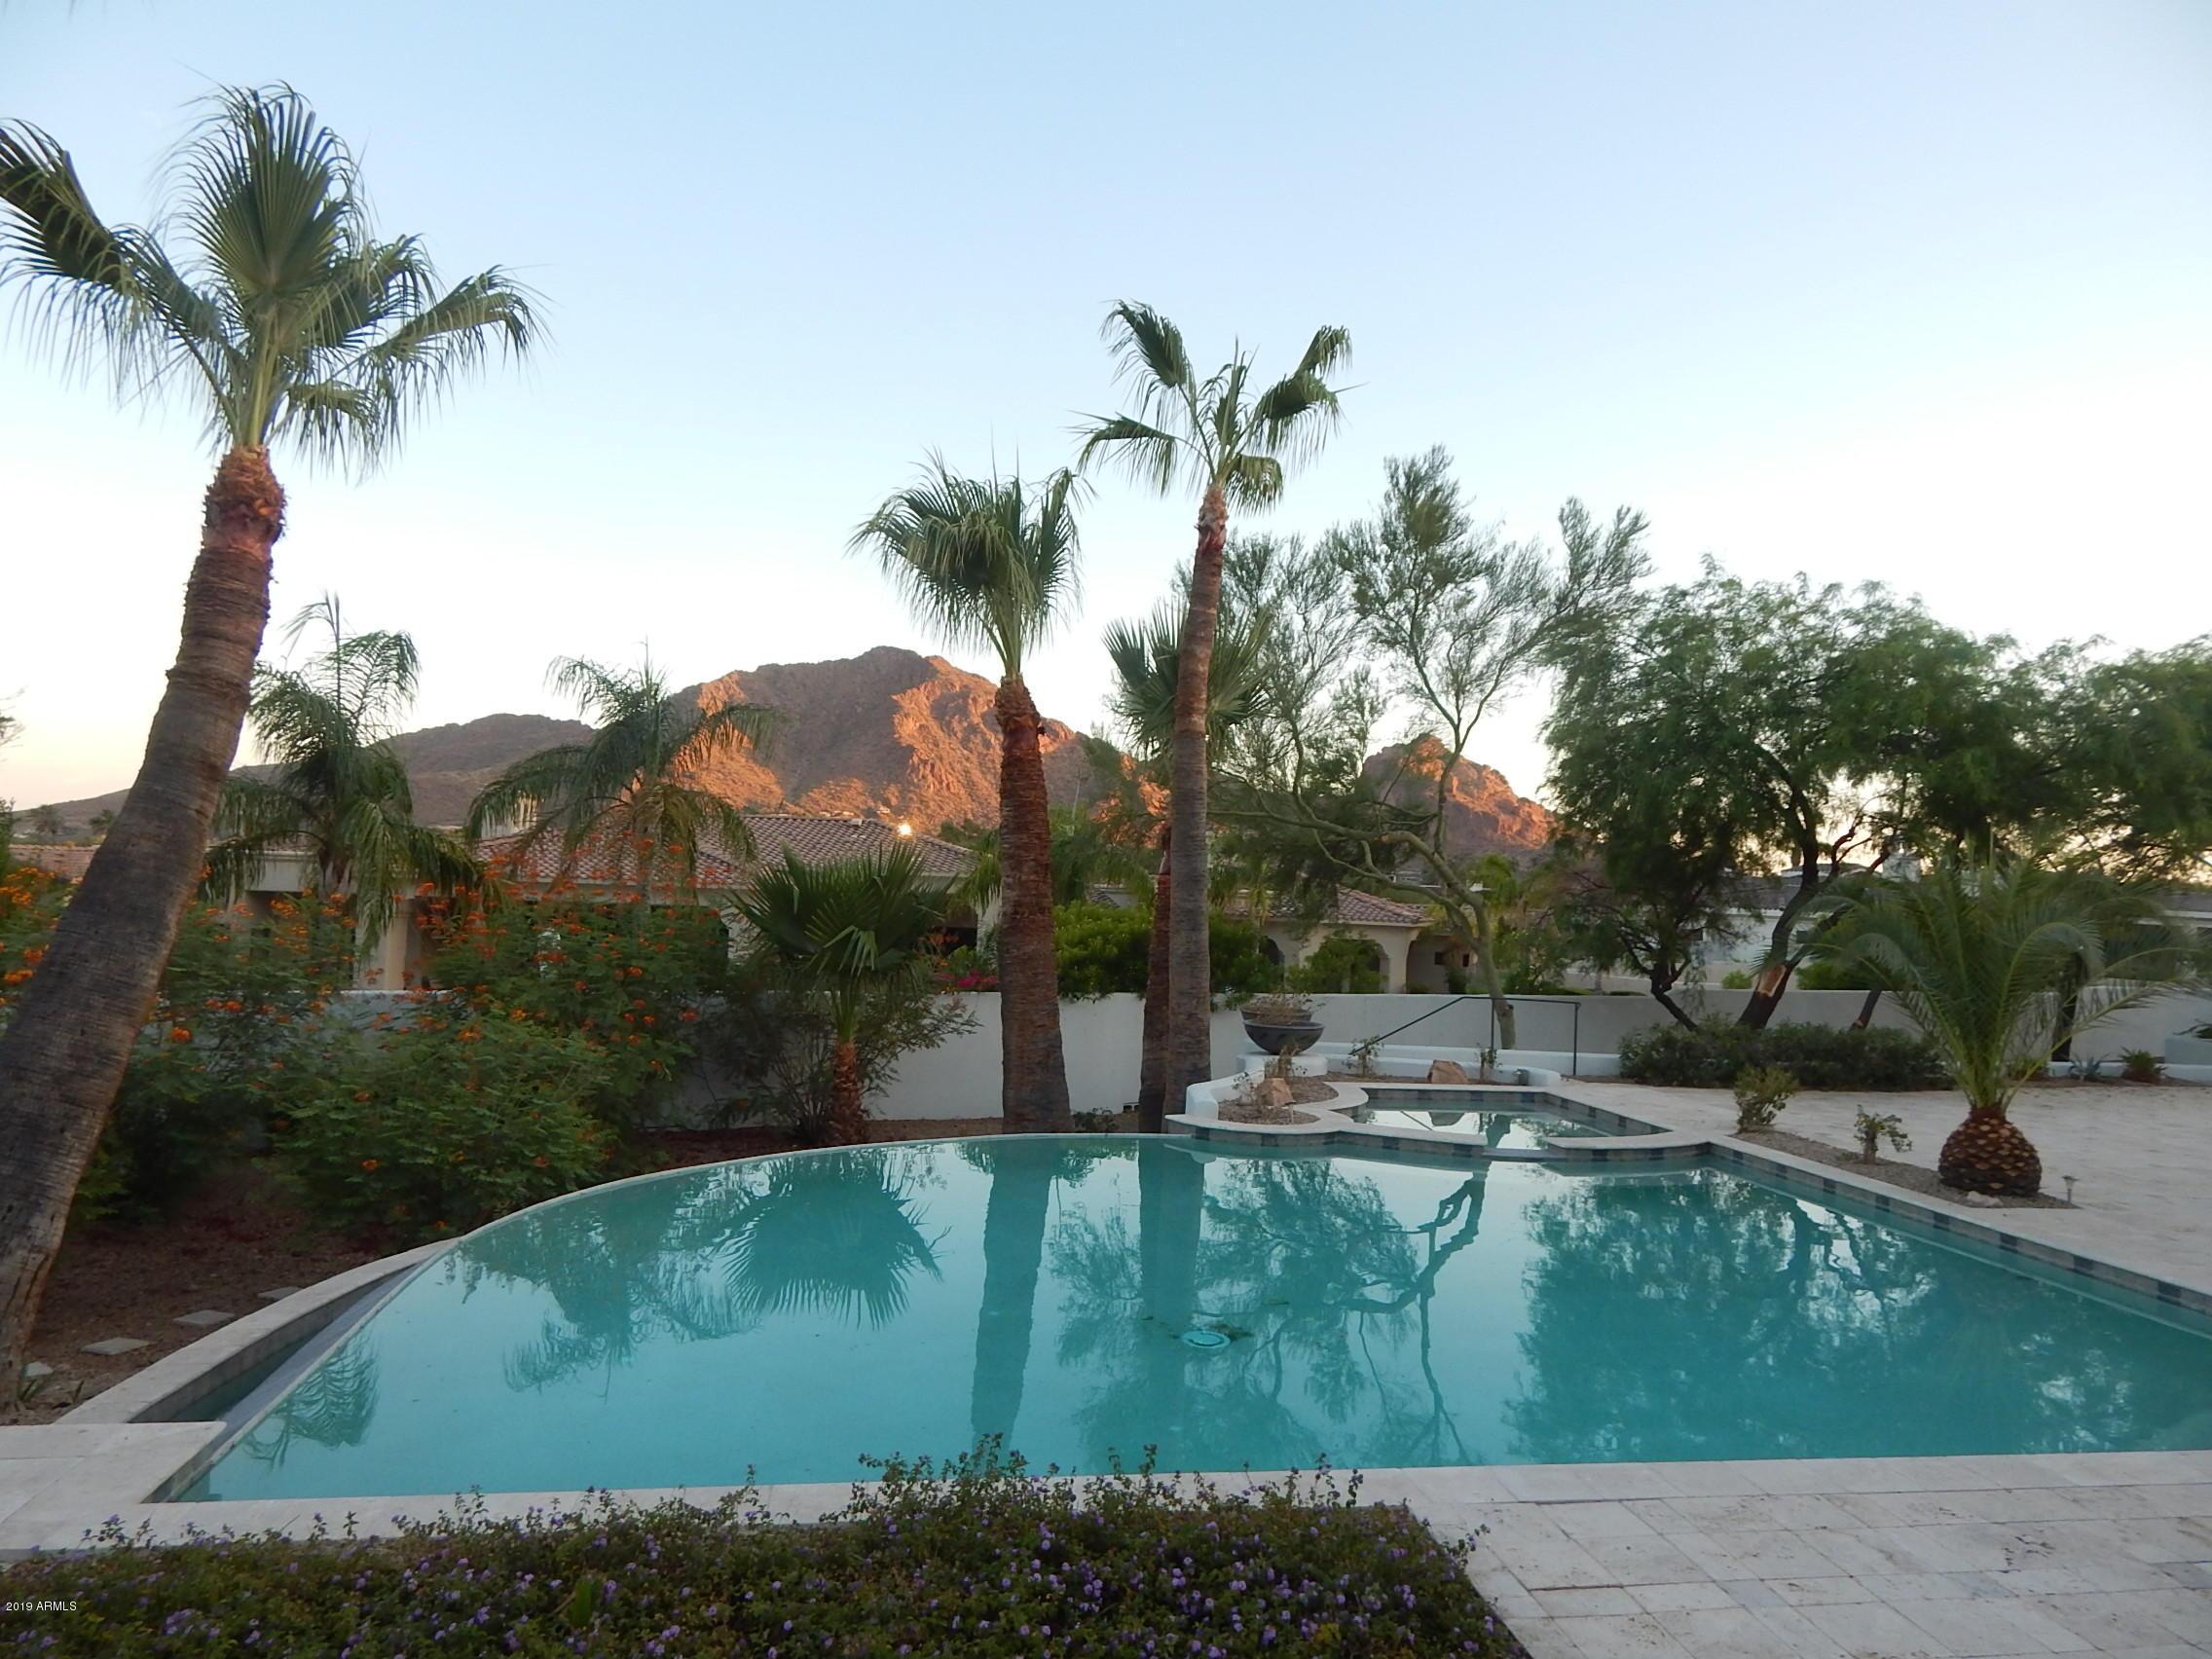 MLS 5952725 5739 E JOSHUA TREE Lane, Paradise Valley, AZ 85253 Paradise Valley AZ REO Bank Owned Foreclosure